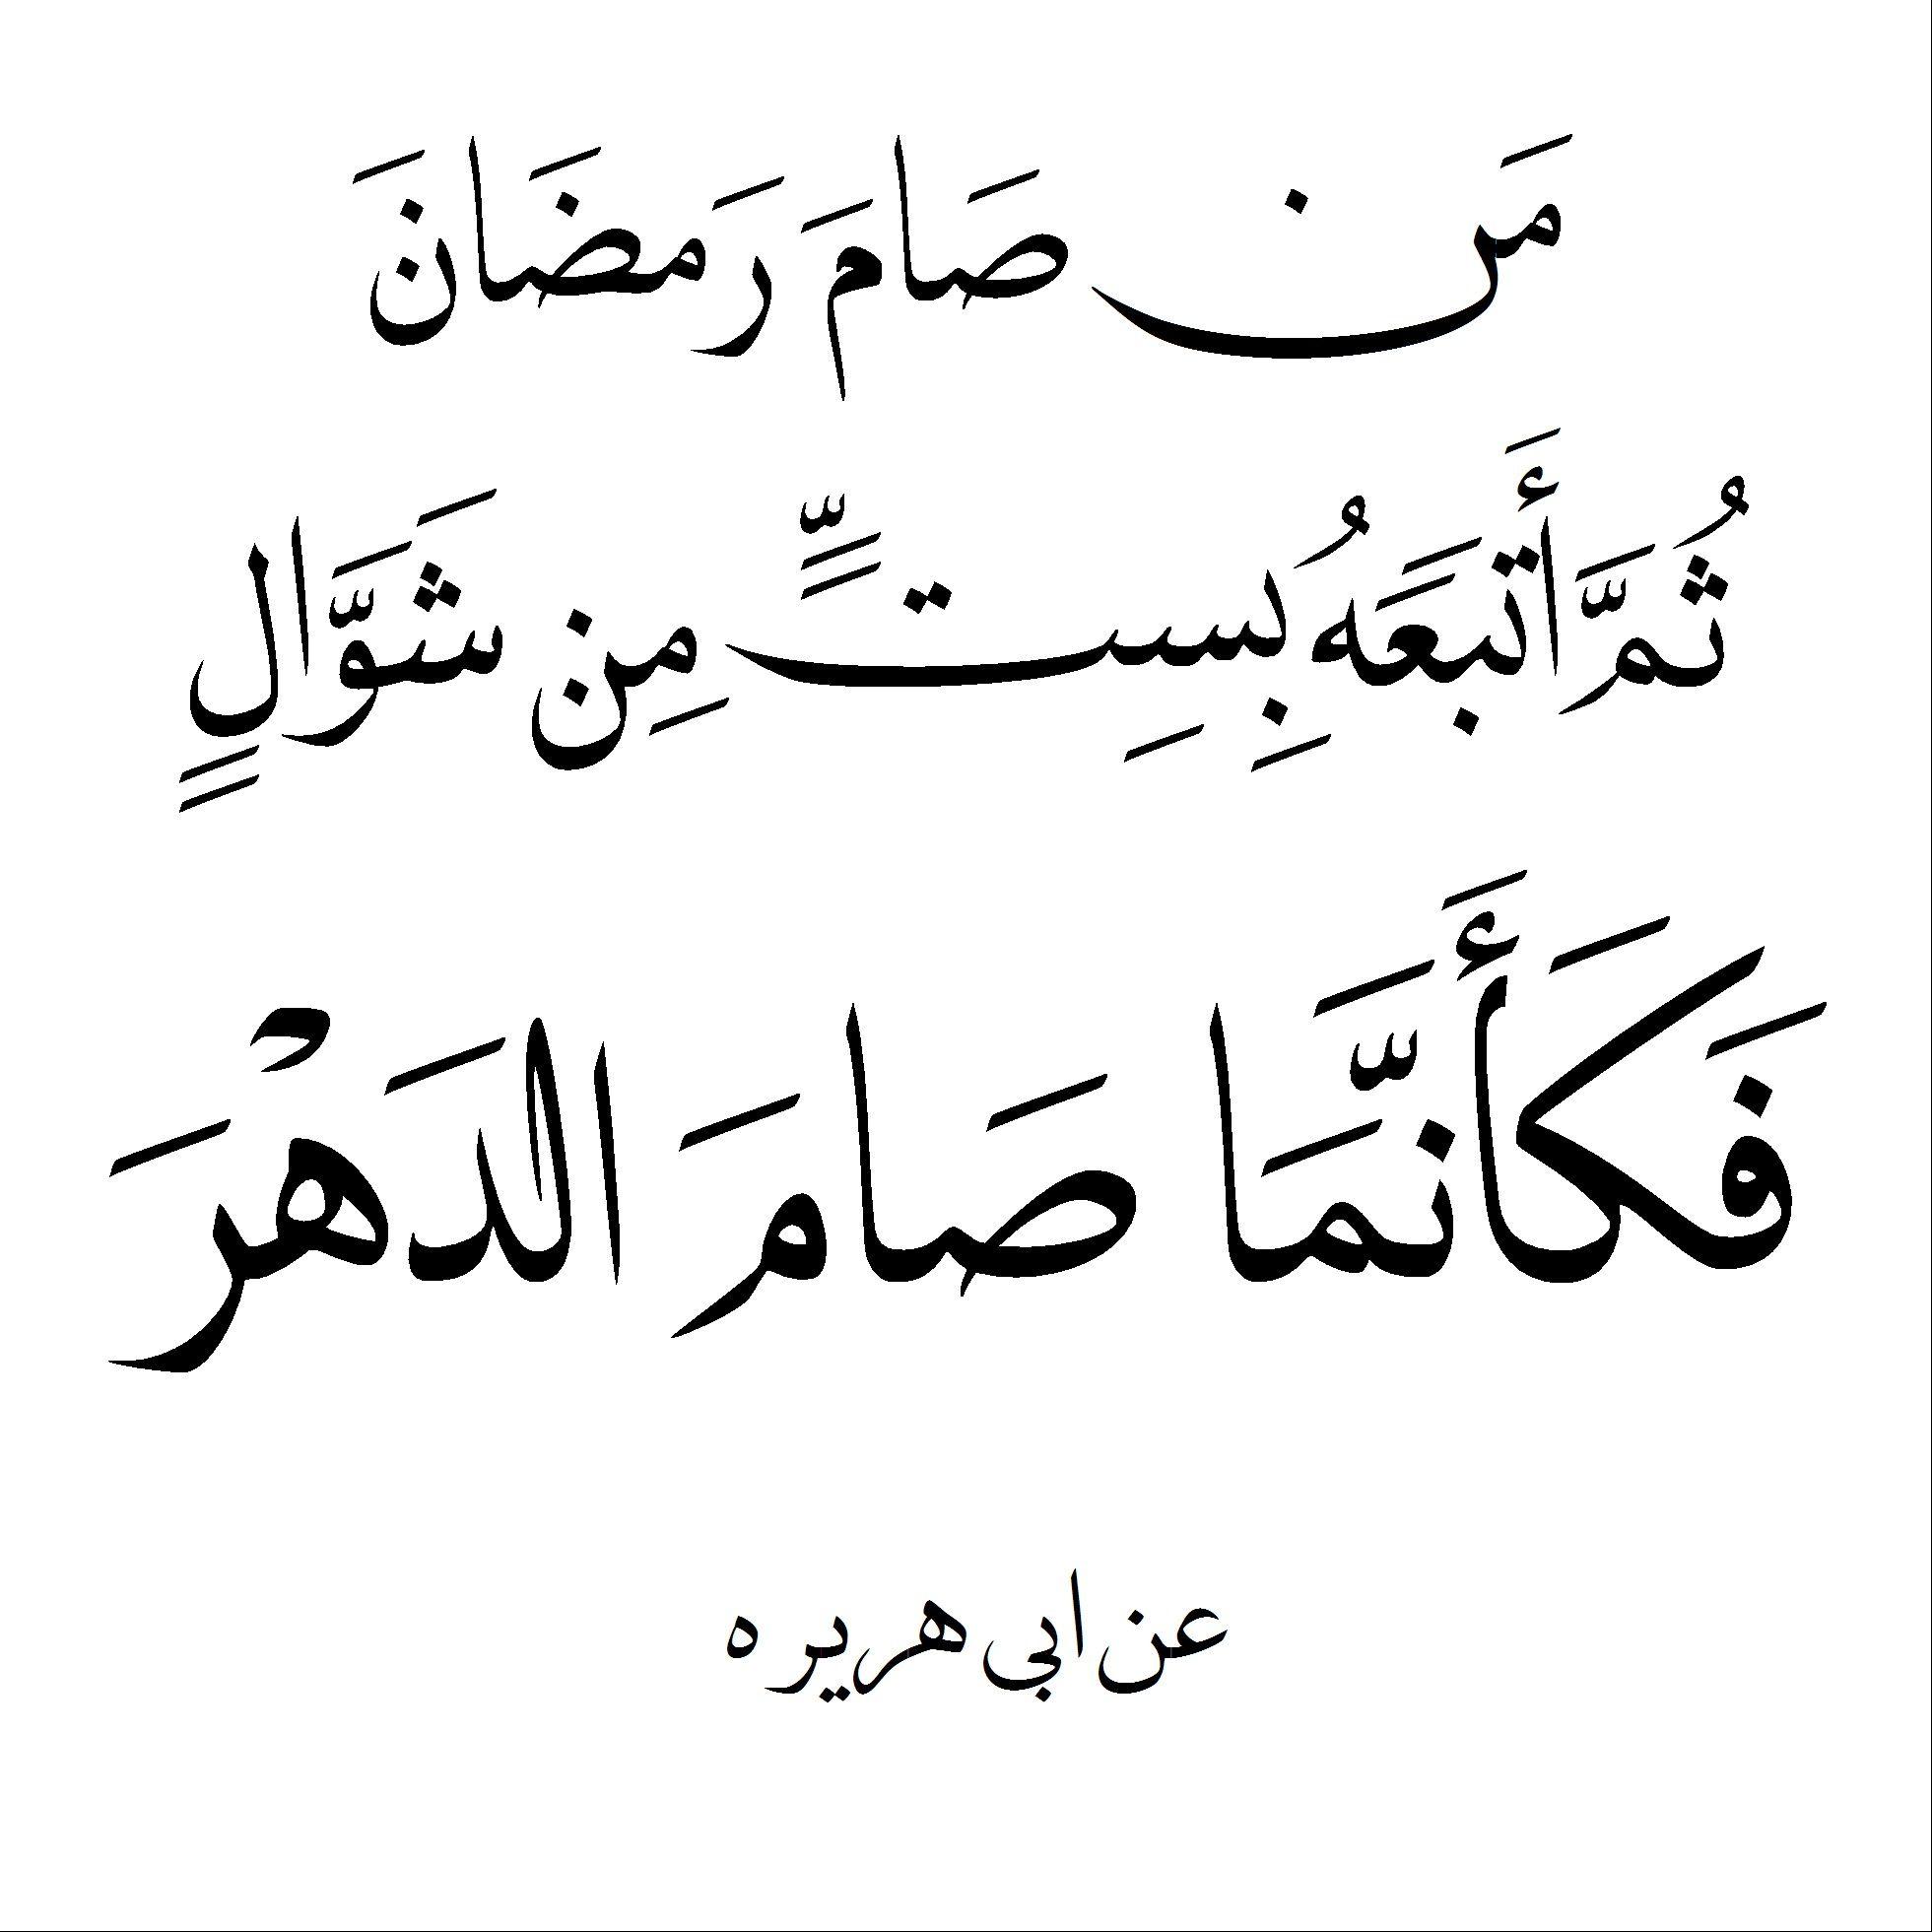 من صام رمضان ثم اتبعه بست من شوال فكانما صام الدهر Islamic Quotes Quran Verses Sweet Words